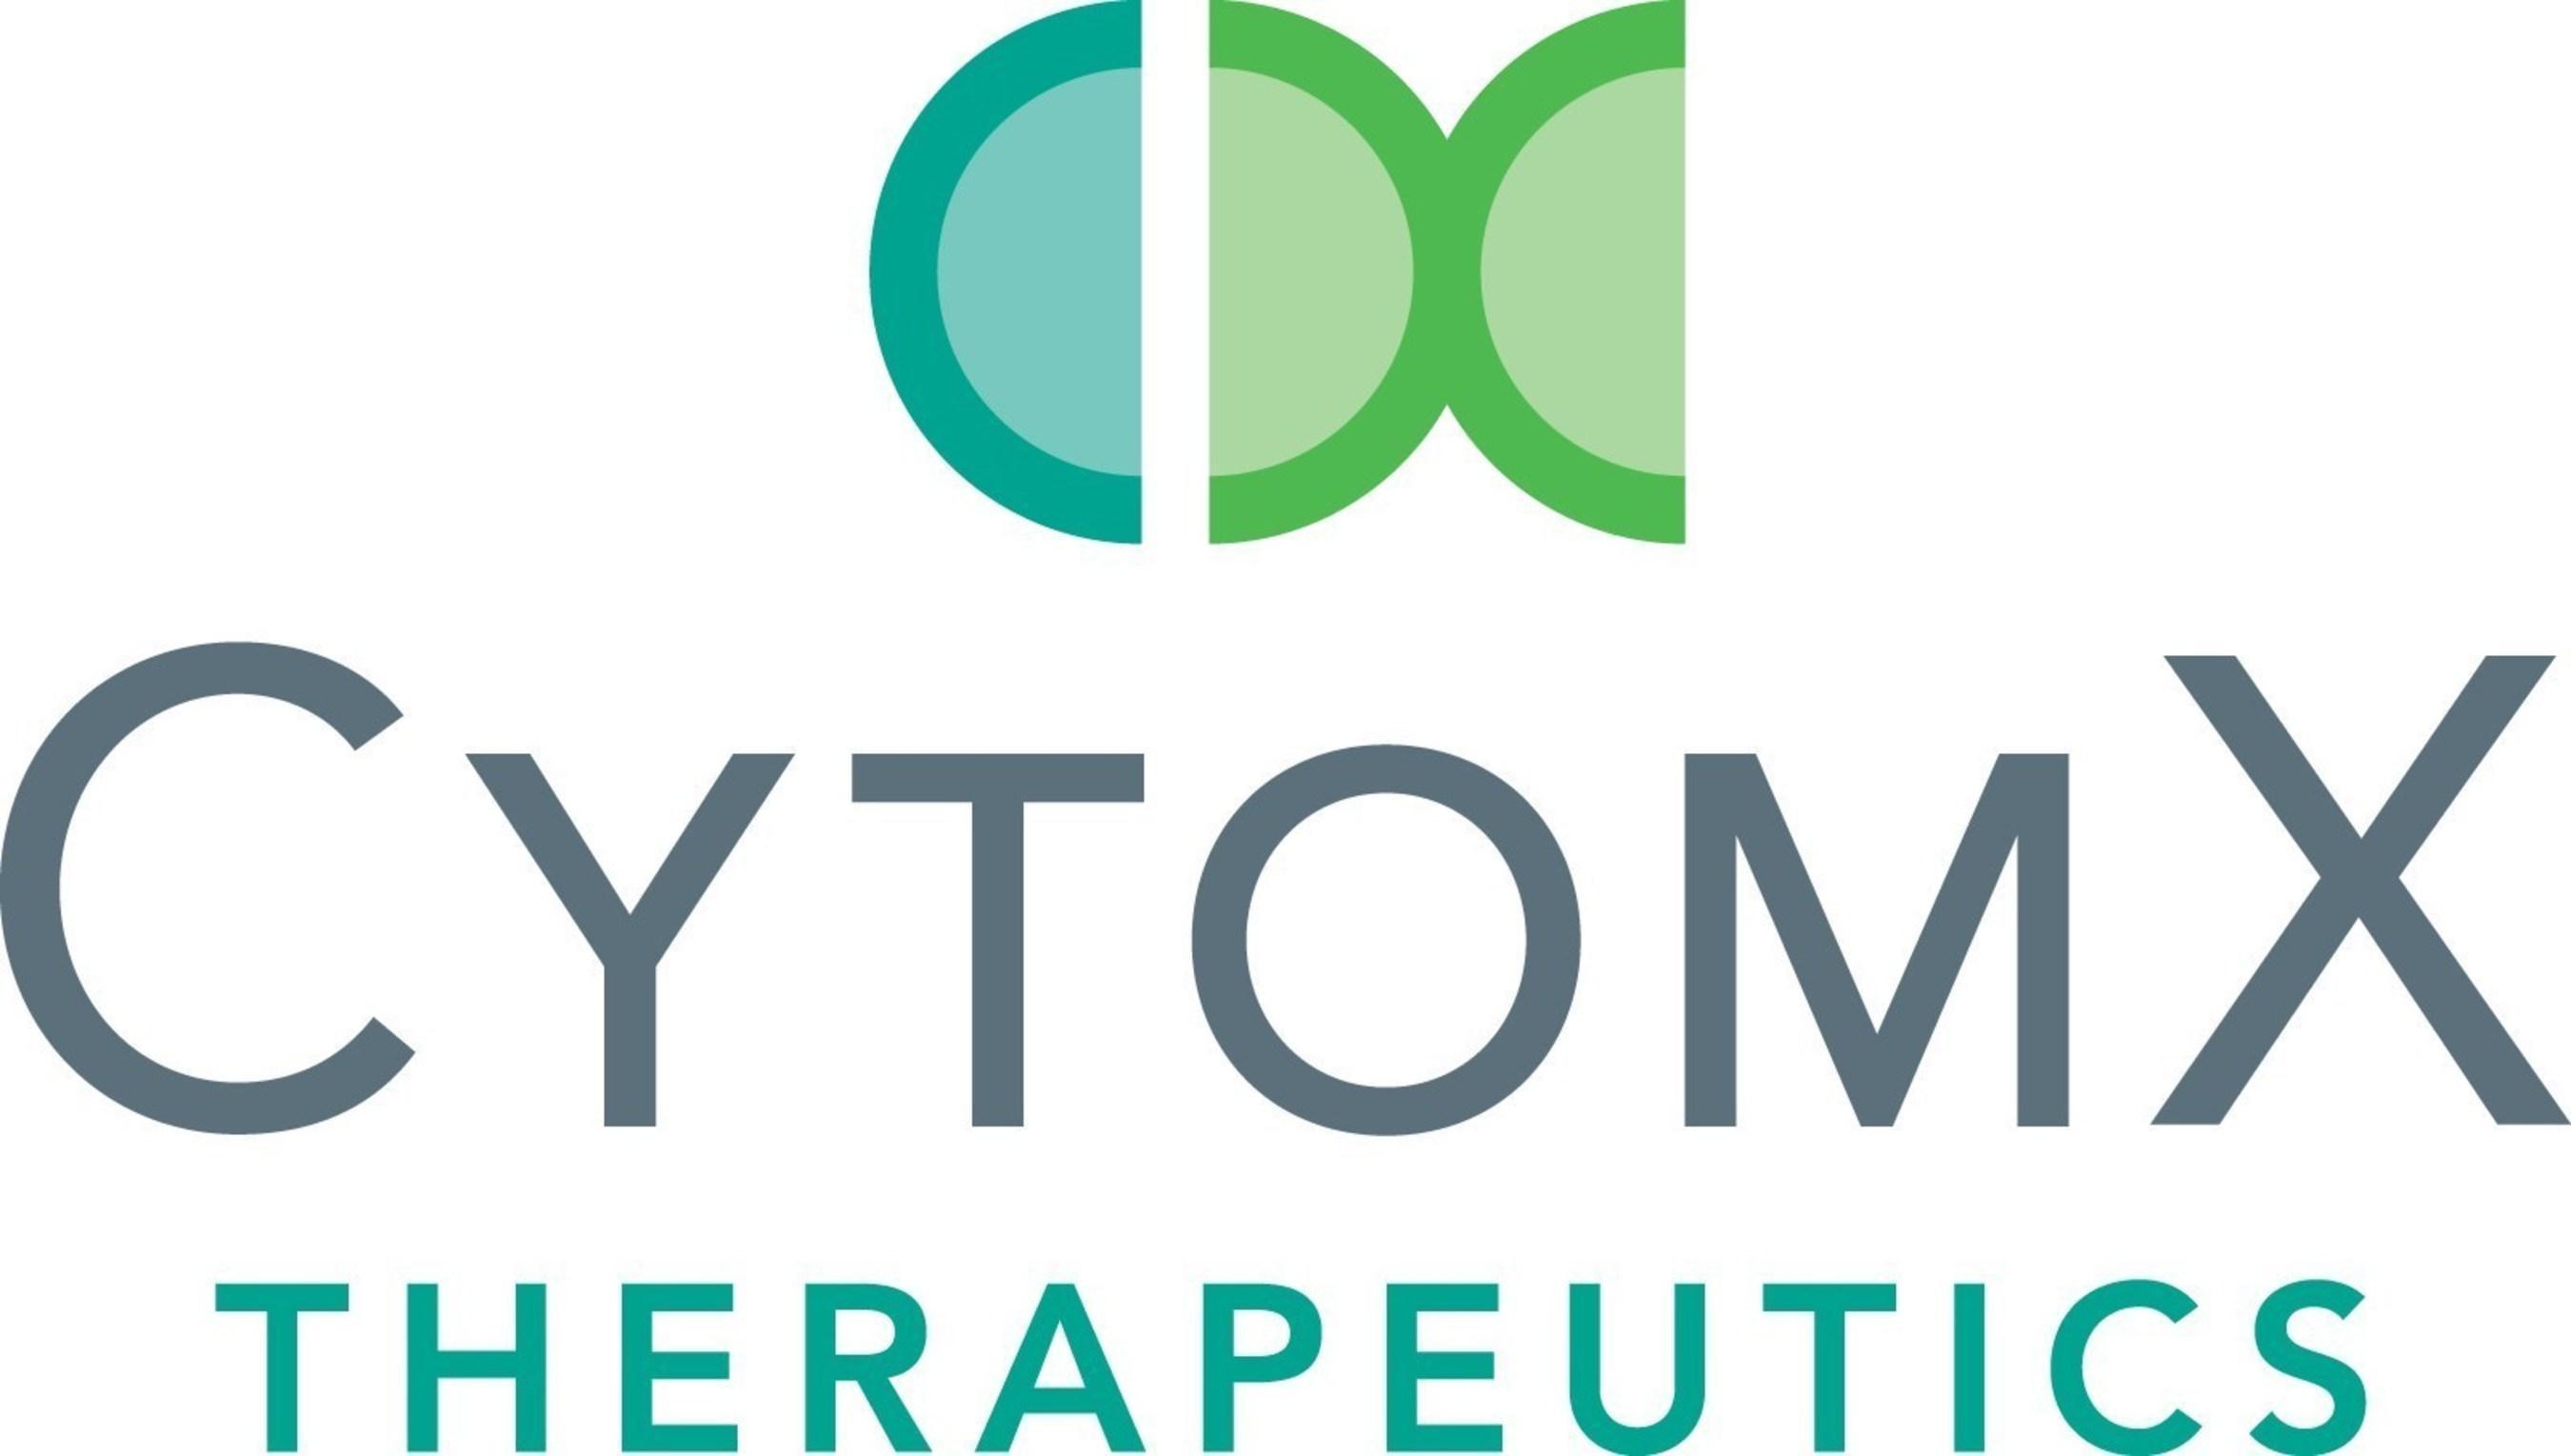 cytomx-therapeutics_owler_20190610_170130_original